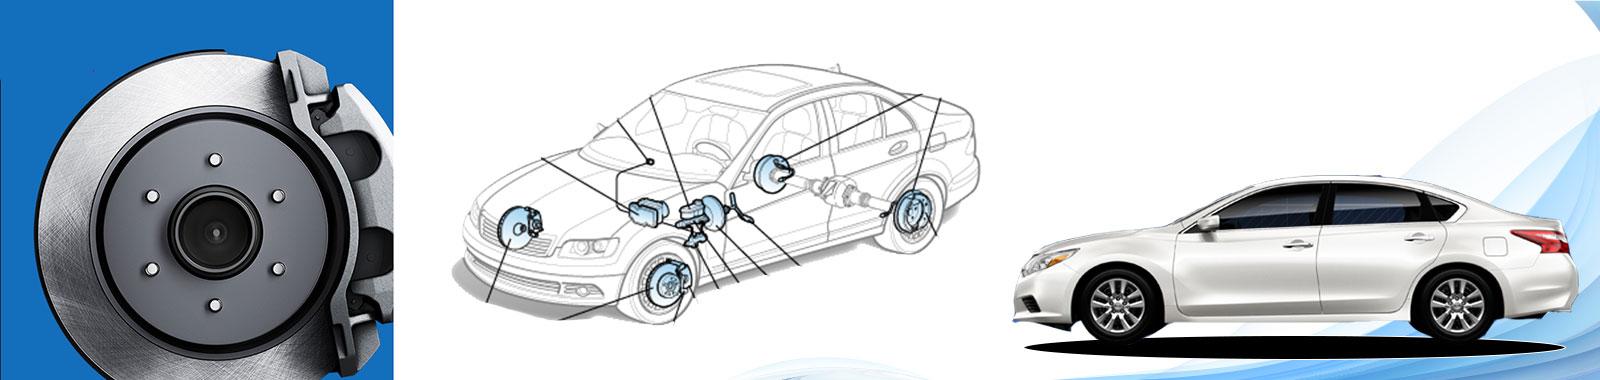 Nissan Brakes | Preston Nissan, Your Nissan Annapolis Dealer